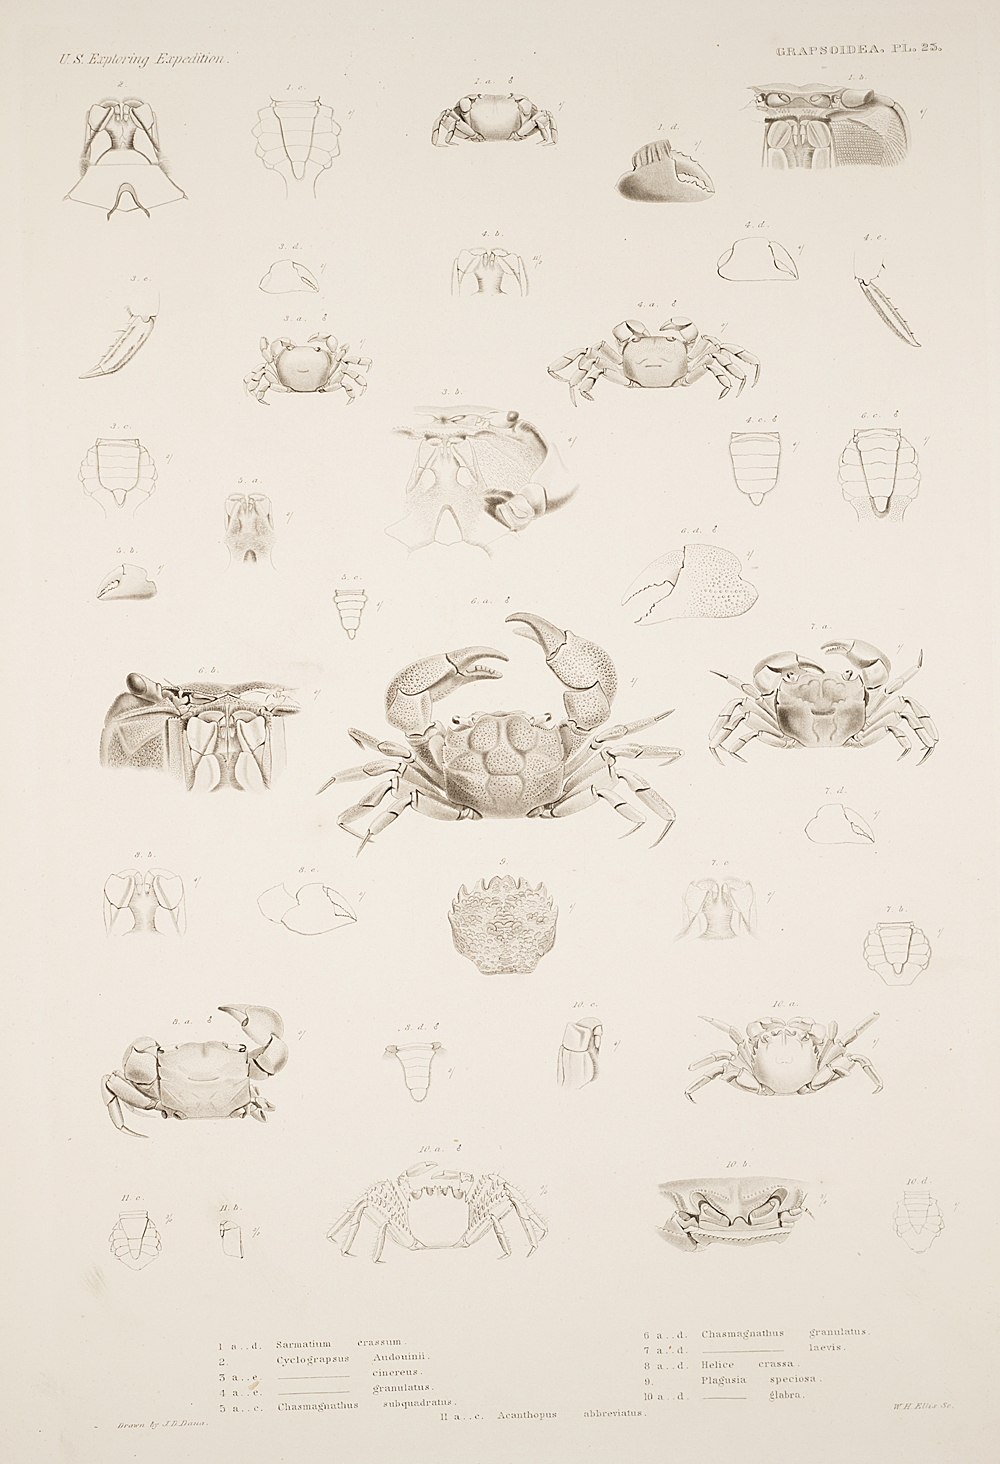 Grapstoidea. Pl. 23,  Image number:SIL19-21-079b